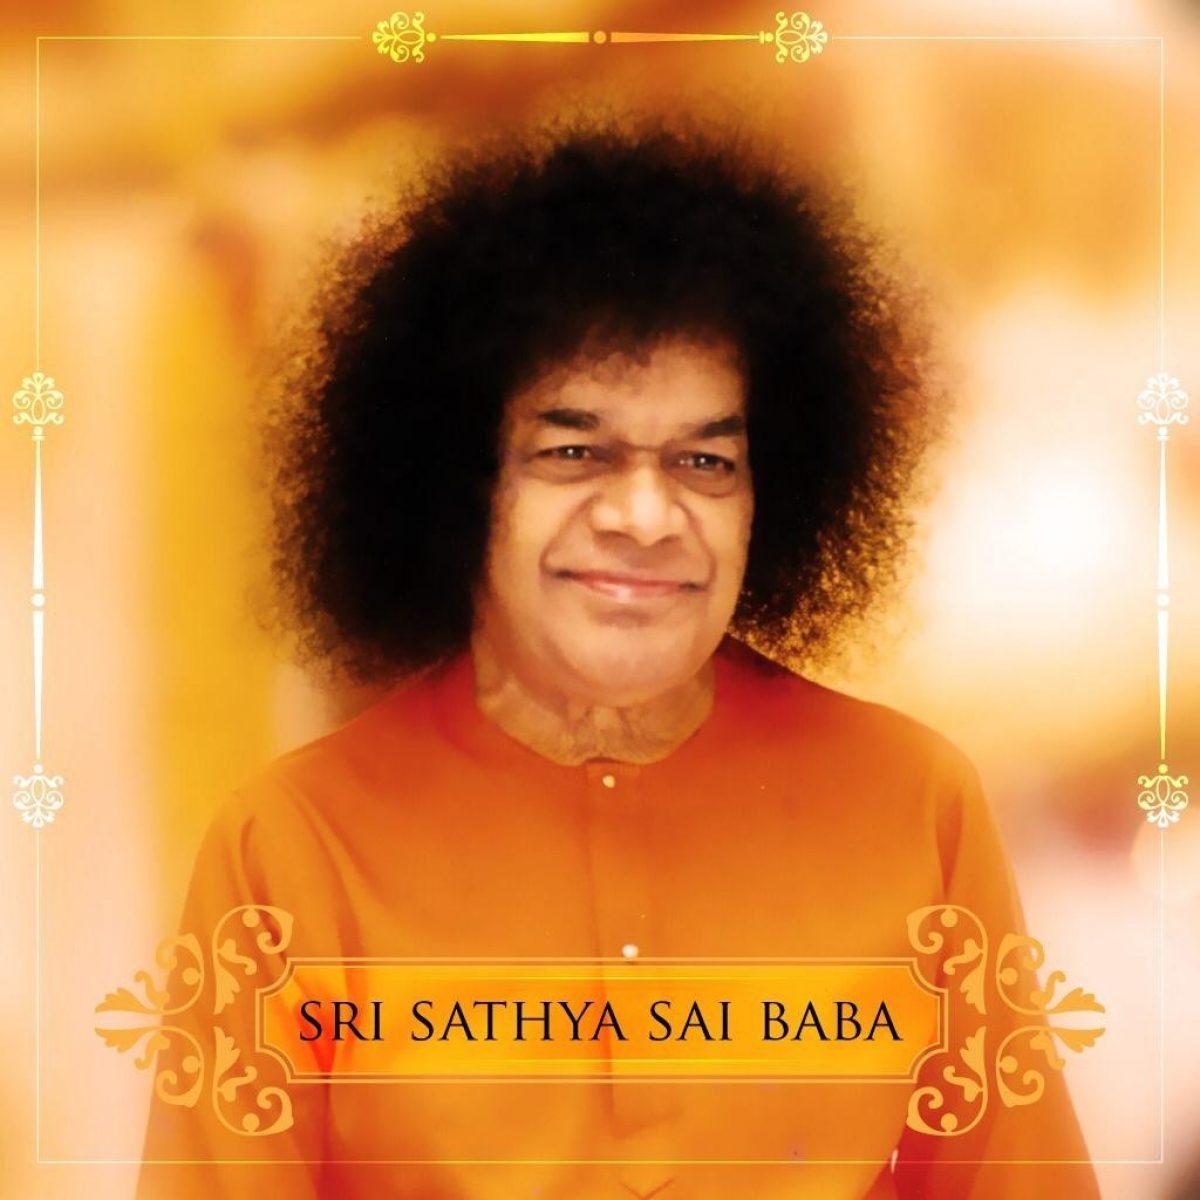 Prashanti Nila Sathya Sai Baba – Grcija